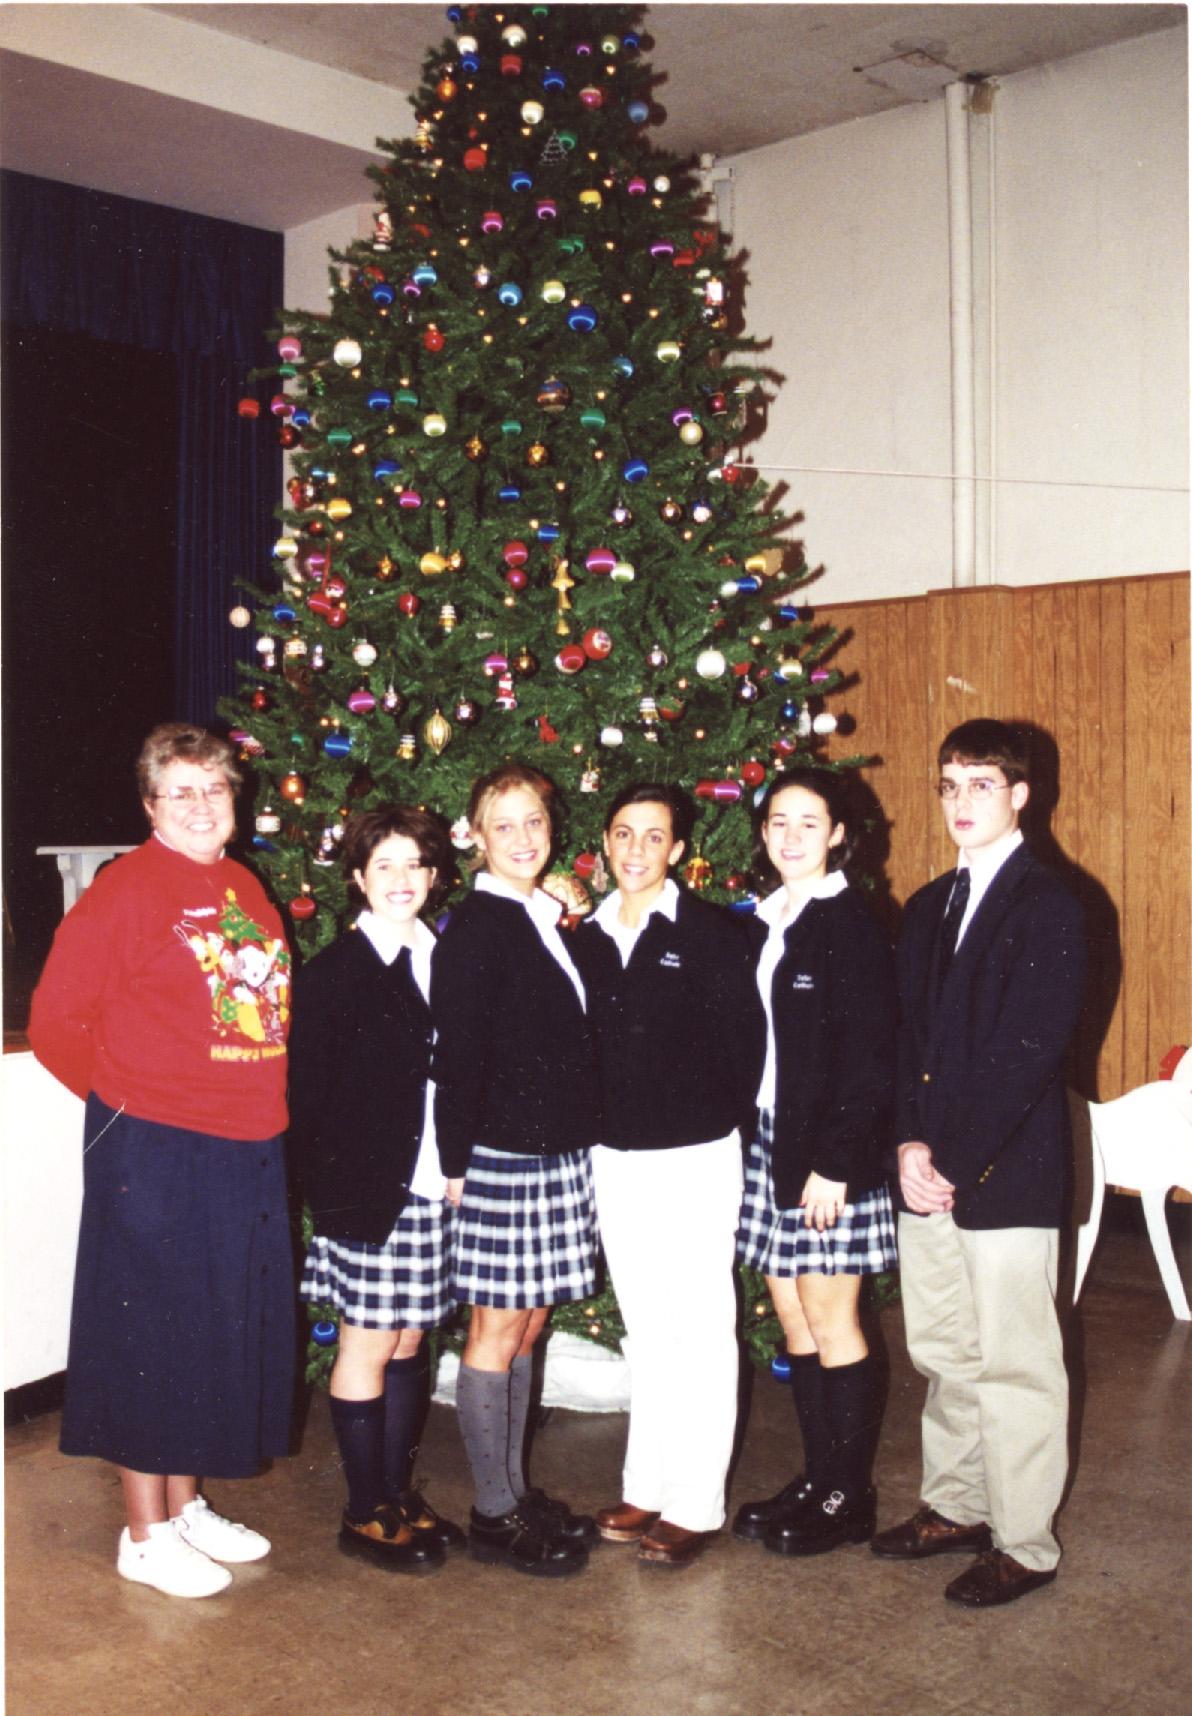 Claire Kulp and Seton Catholic Student Council Dec 2000